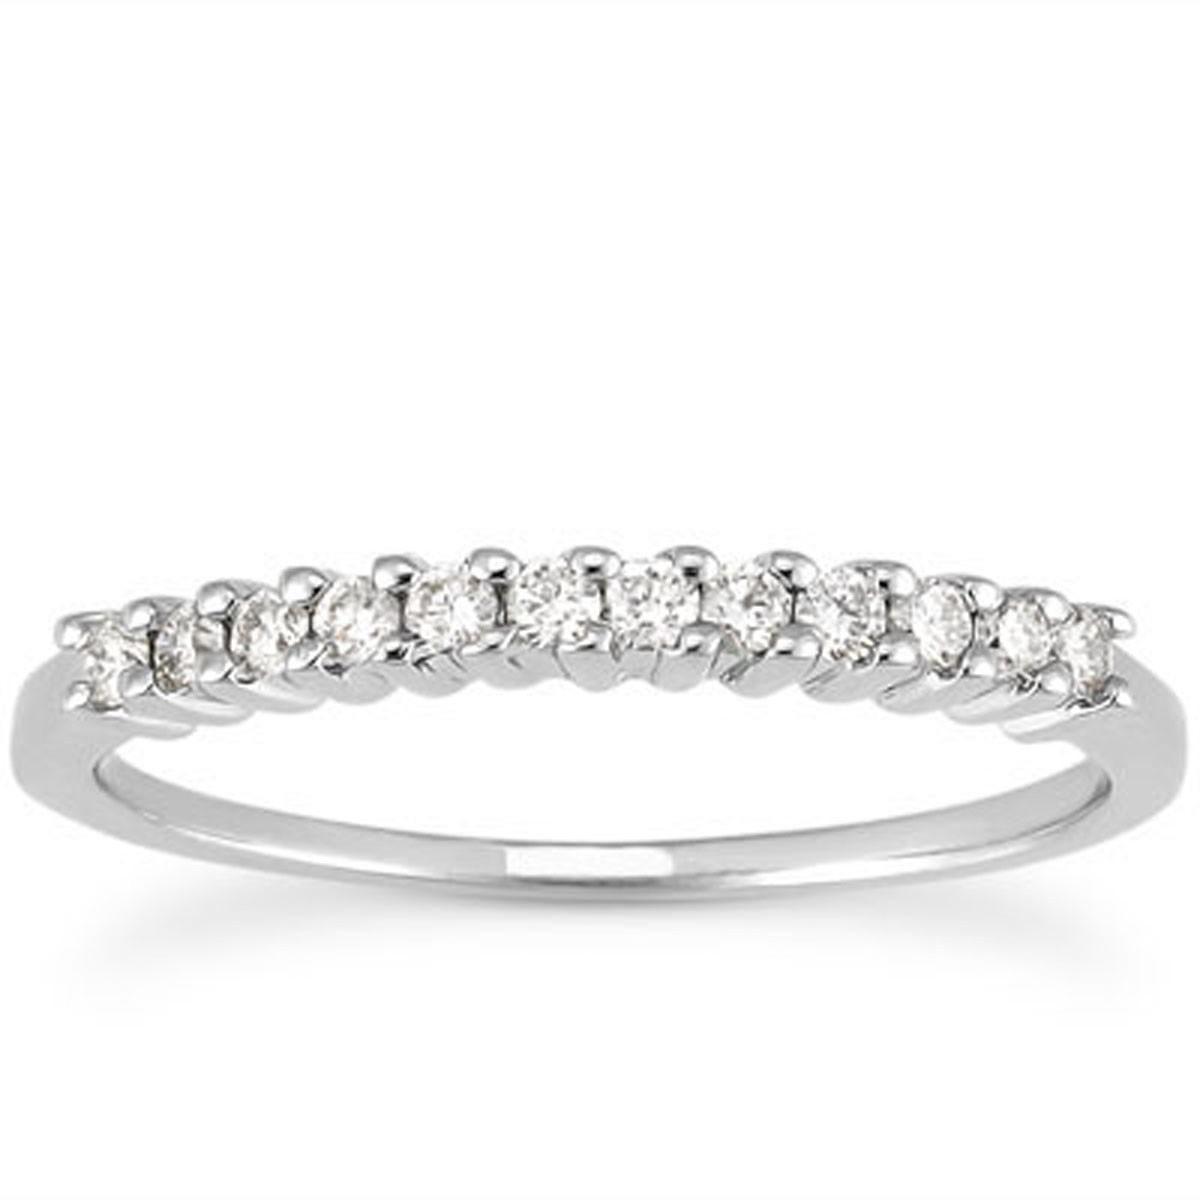 14k White Gold Raised Shared Prong Diamond Wedding Ring Band – 9